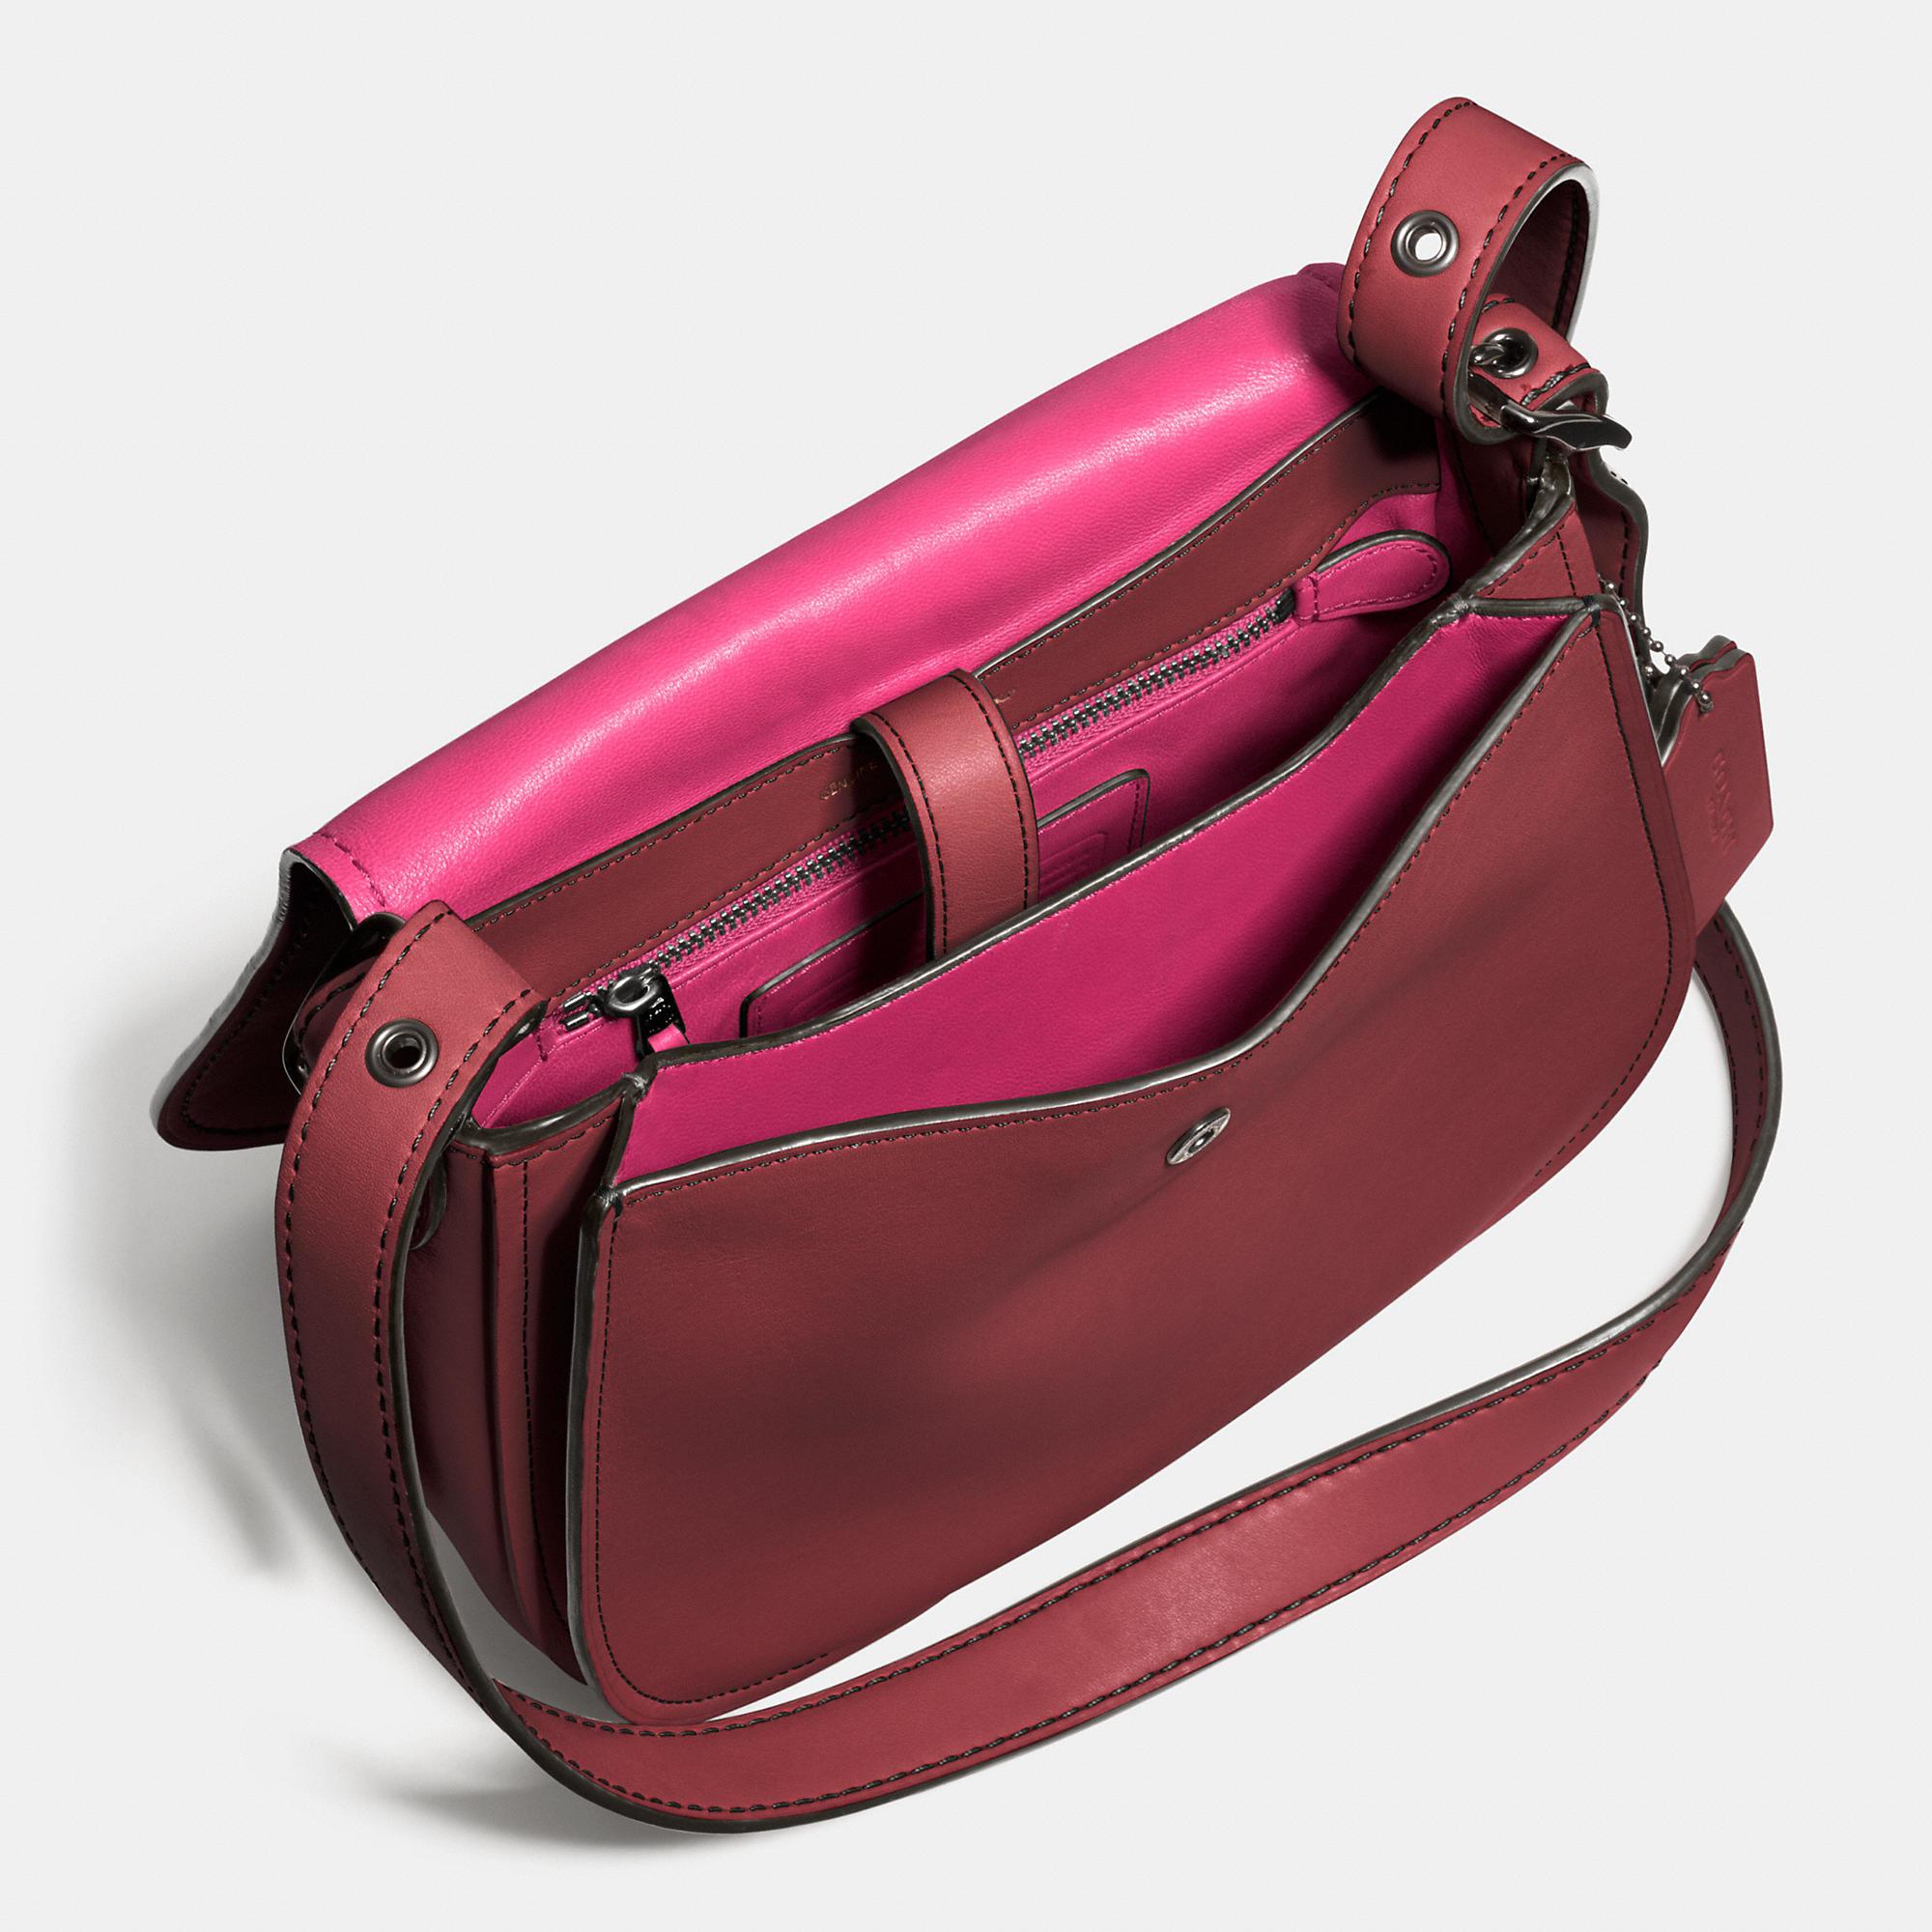 4c4b8022a32 ... ebay lyst coach saddle bag 23 in glovetanned leather in metallic fa5f1  fe008